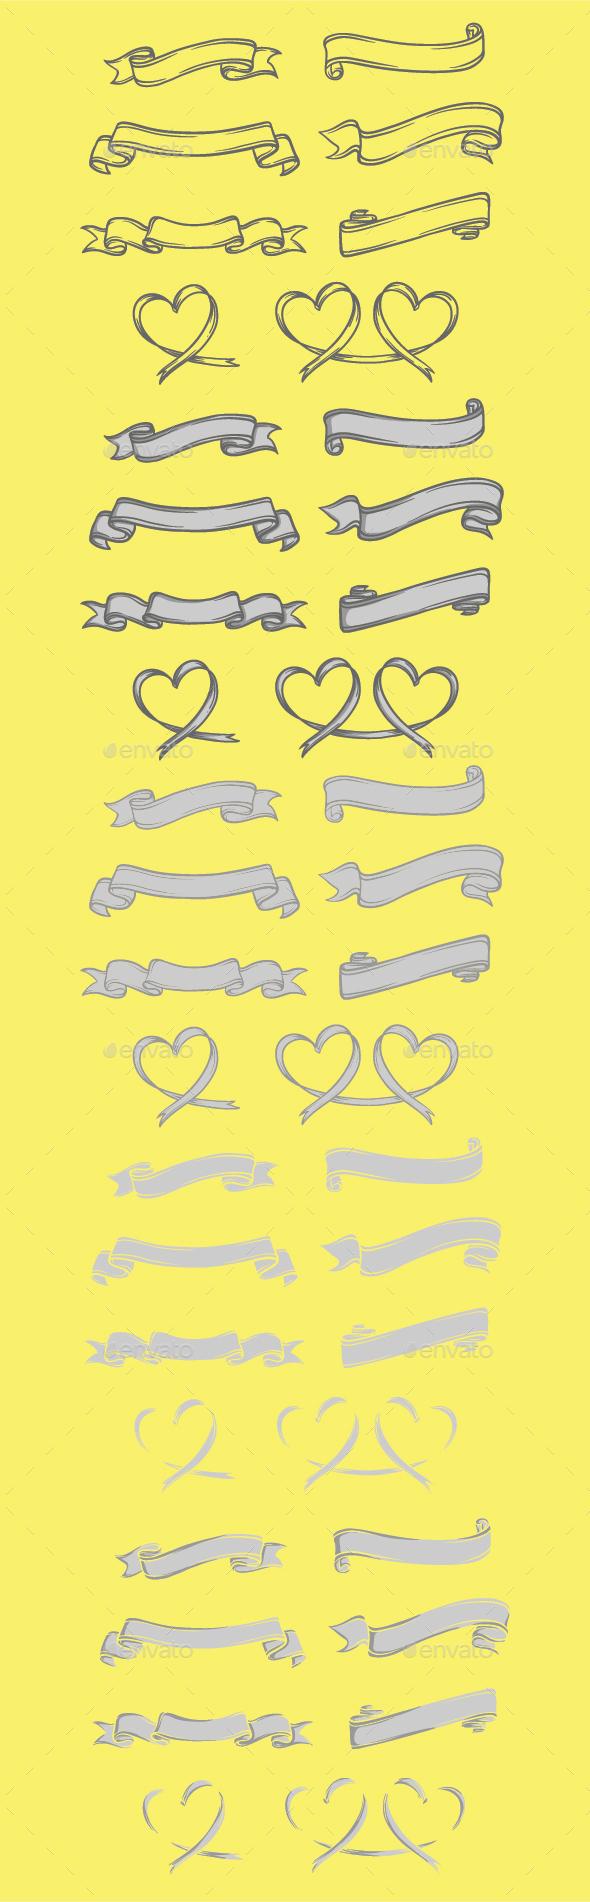 Ribbon Set Handmade - Decorative Symbols Decorative